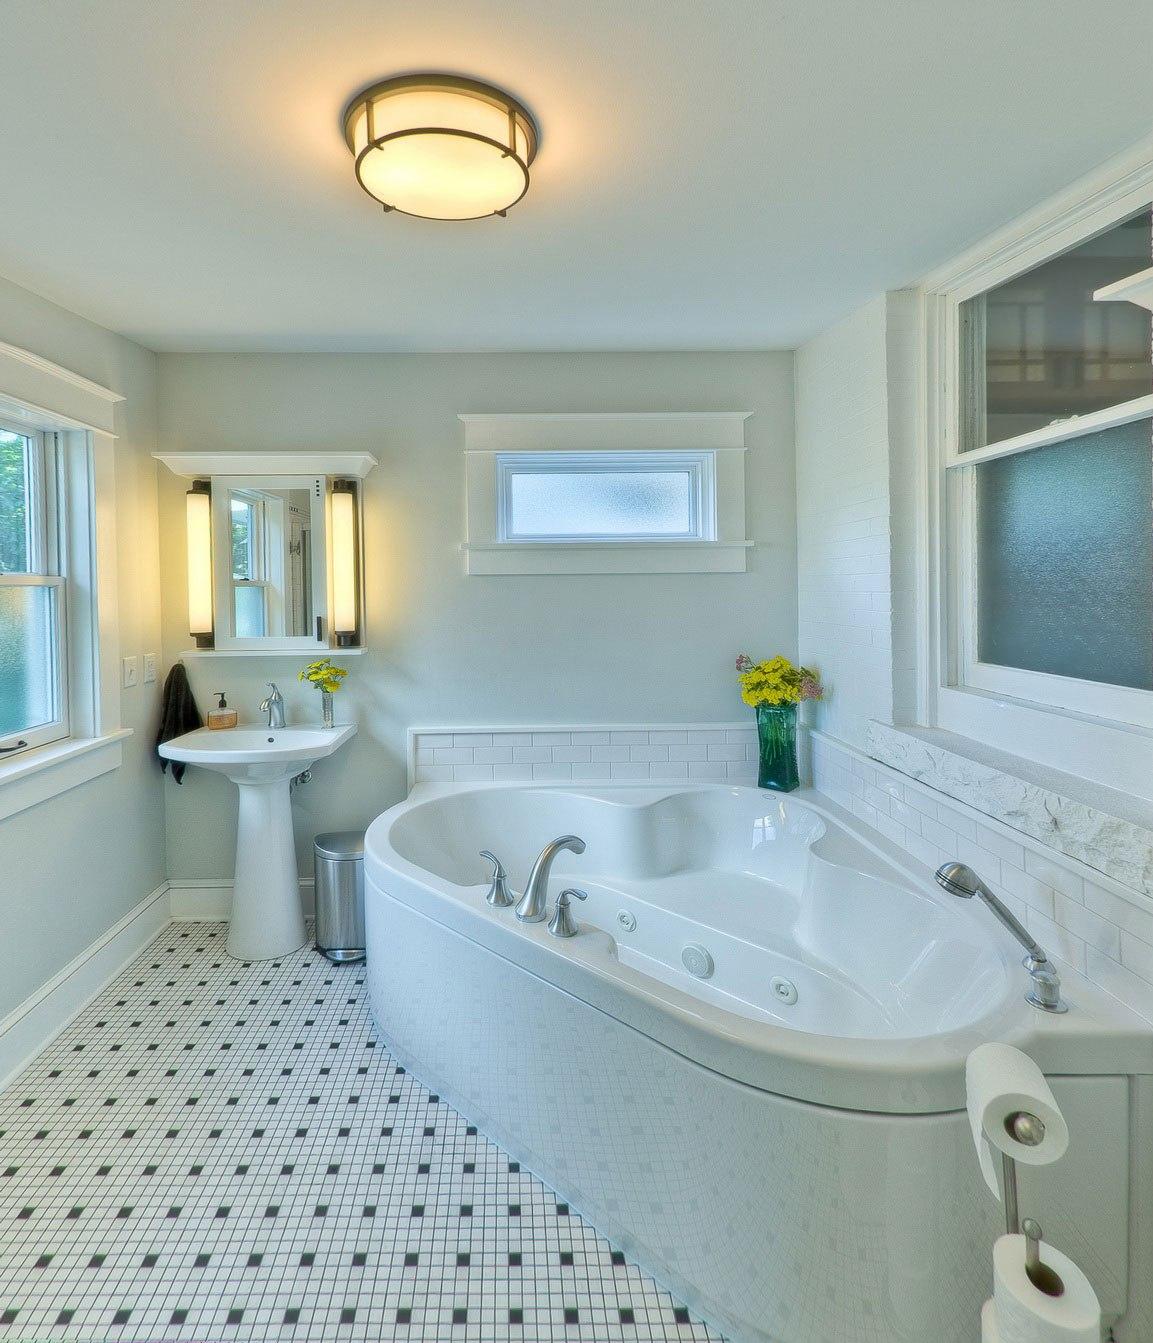 Bathroom remodeling dayton ohio -  Bathroom Remodel Dayton Ohio Download